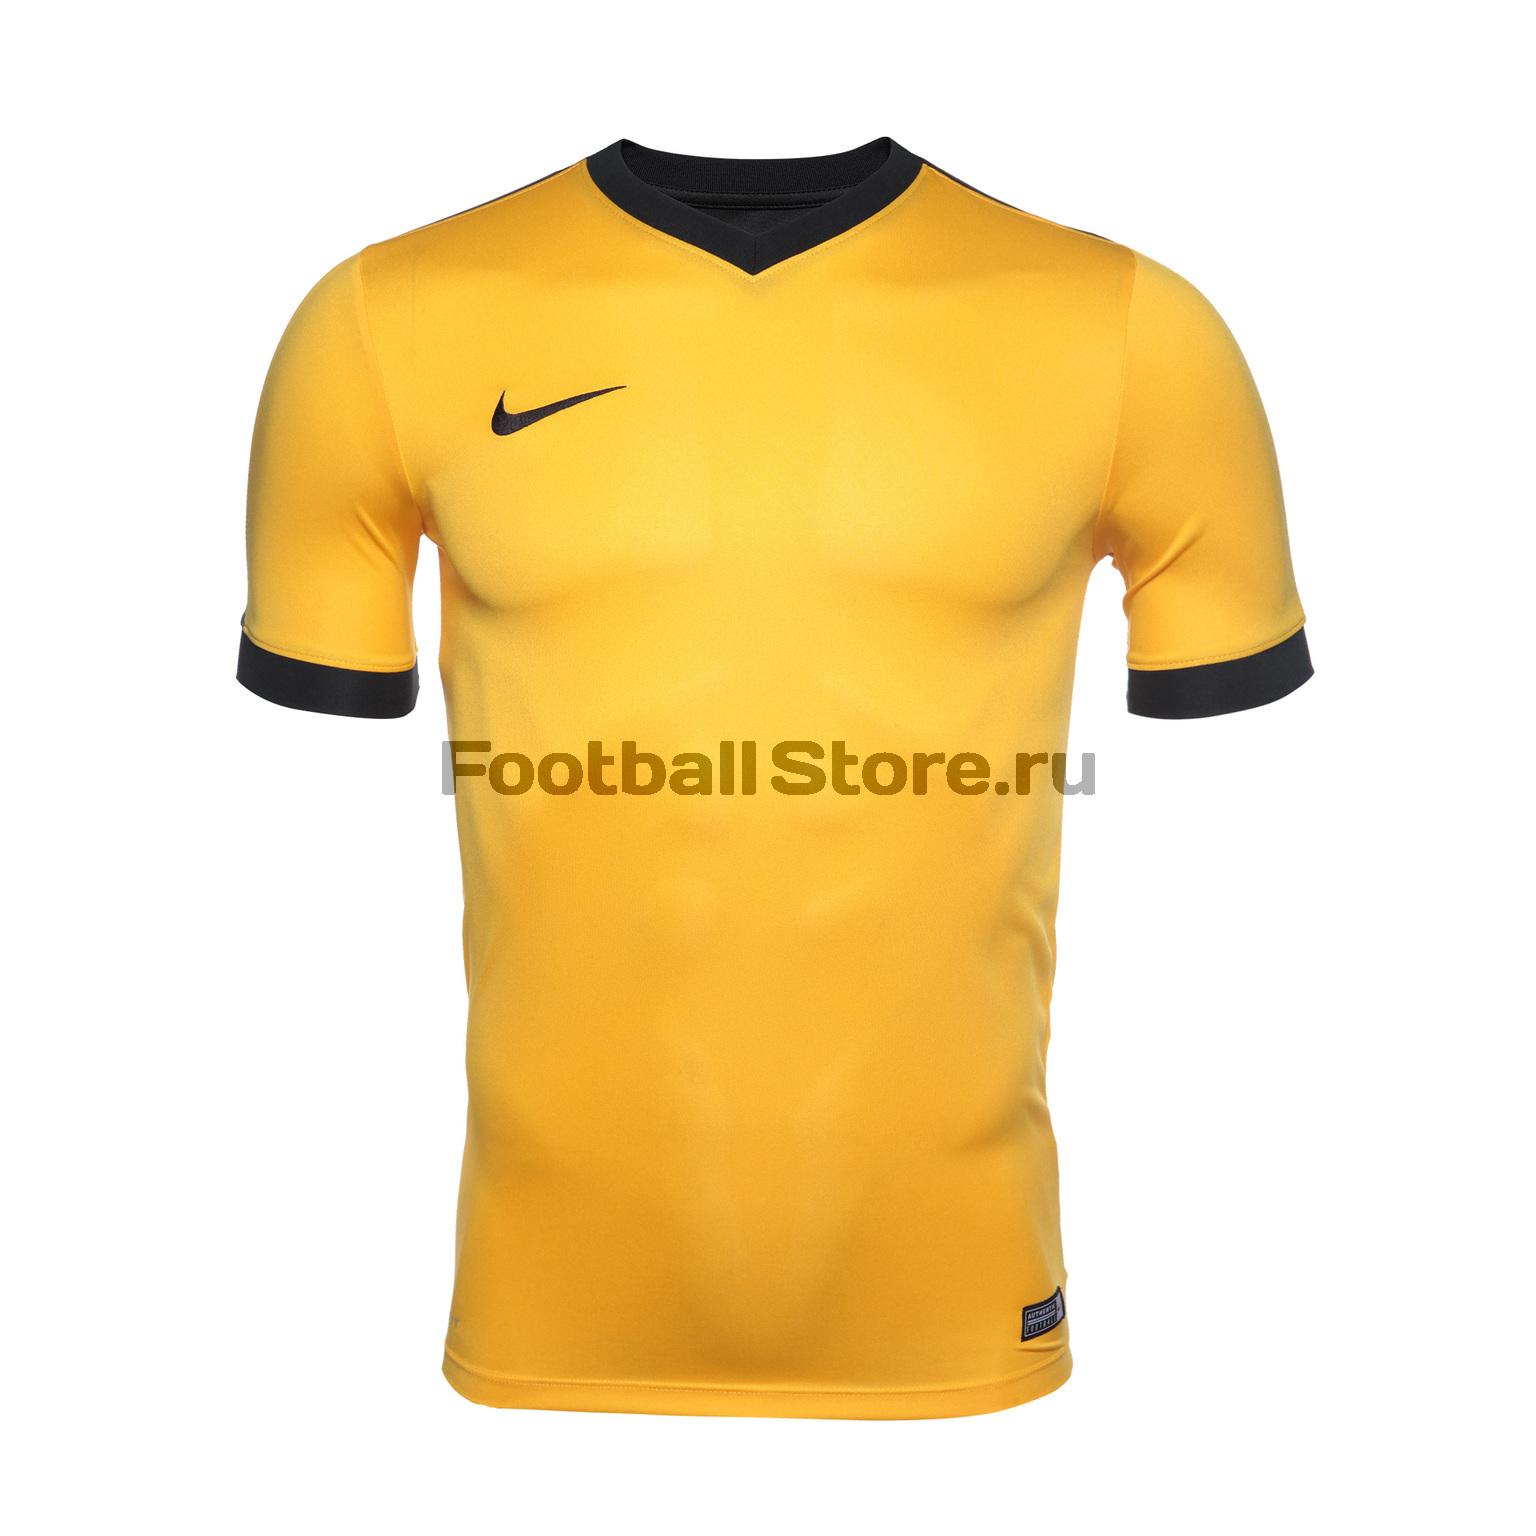 Футболки Nike Футболка Nike SS Striker IV JSY 725892-739 футболки nike футболка nike ss striker iv jsy 725892 815